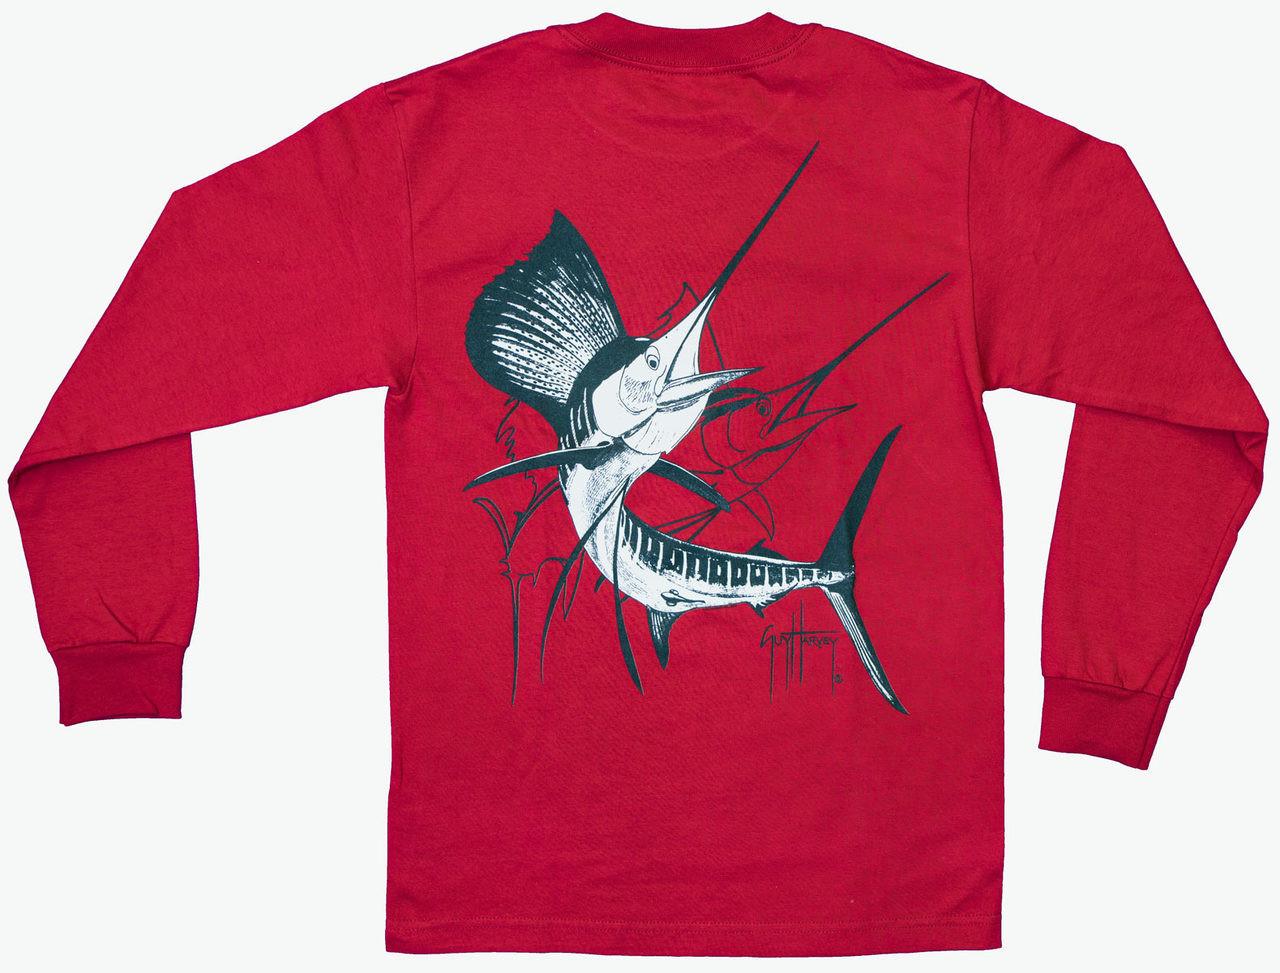 defb34beecb2 Guy Harvey Shirts Long Sleeve